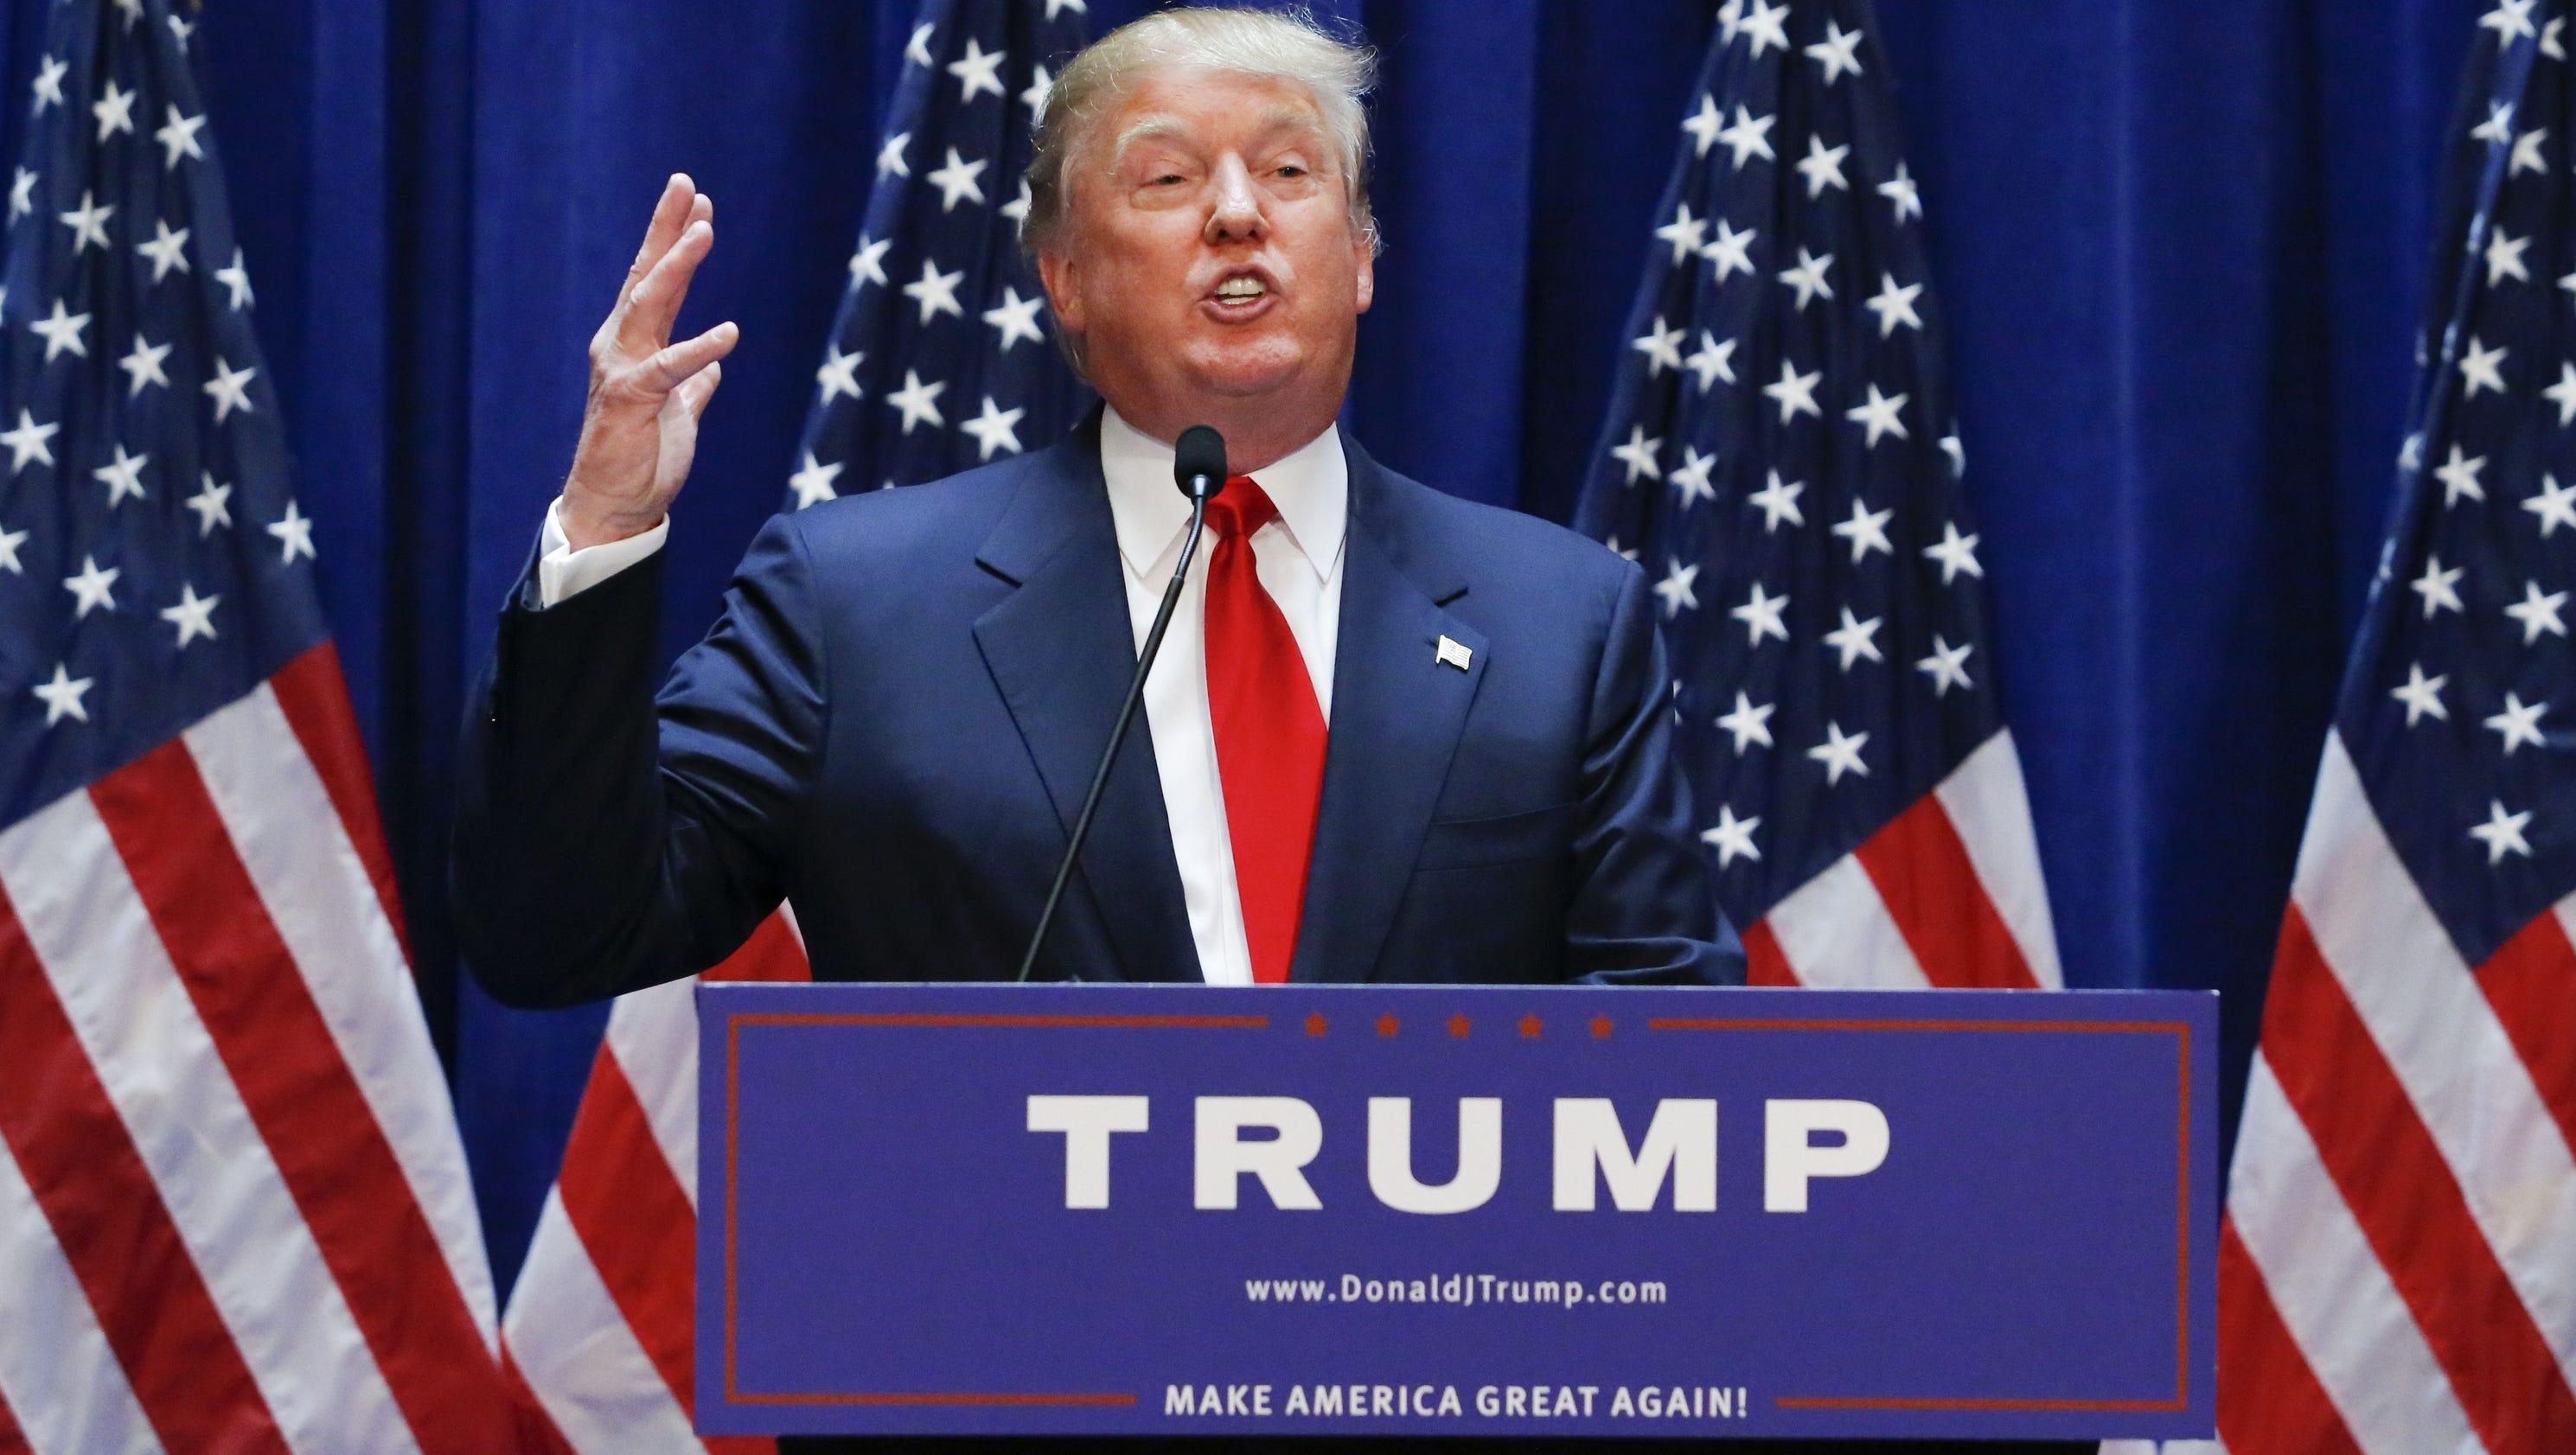 Donald Trump's heated immigration rhetoric rattles GOP ...